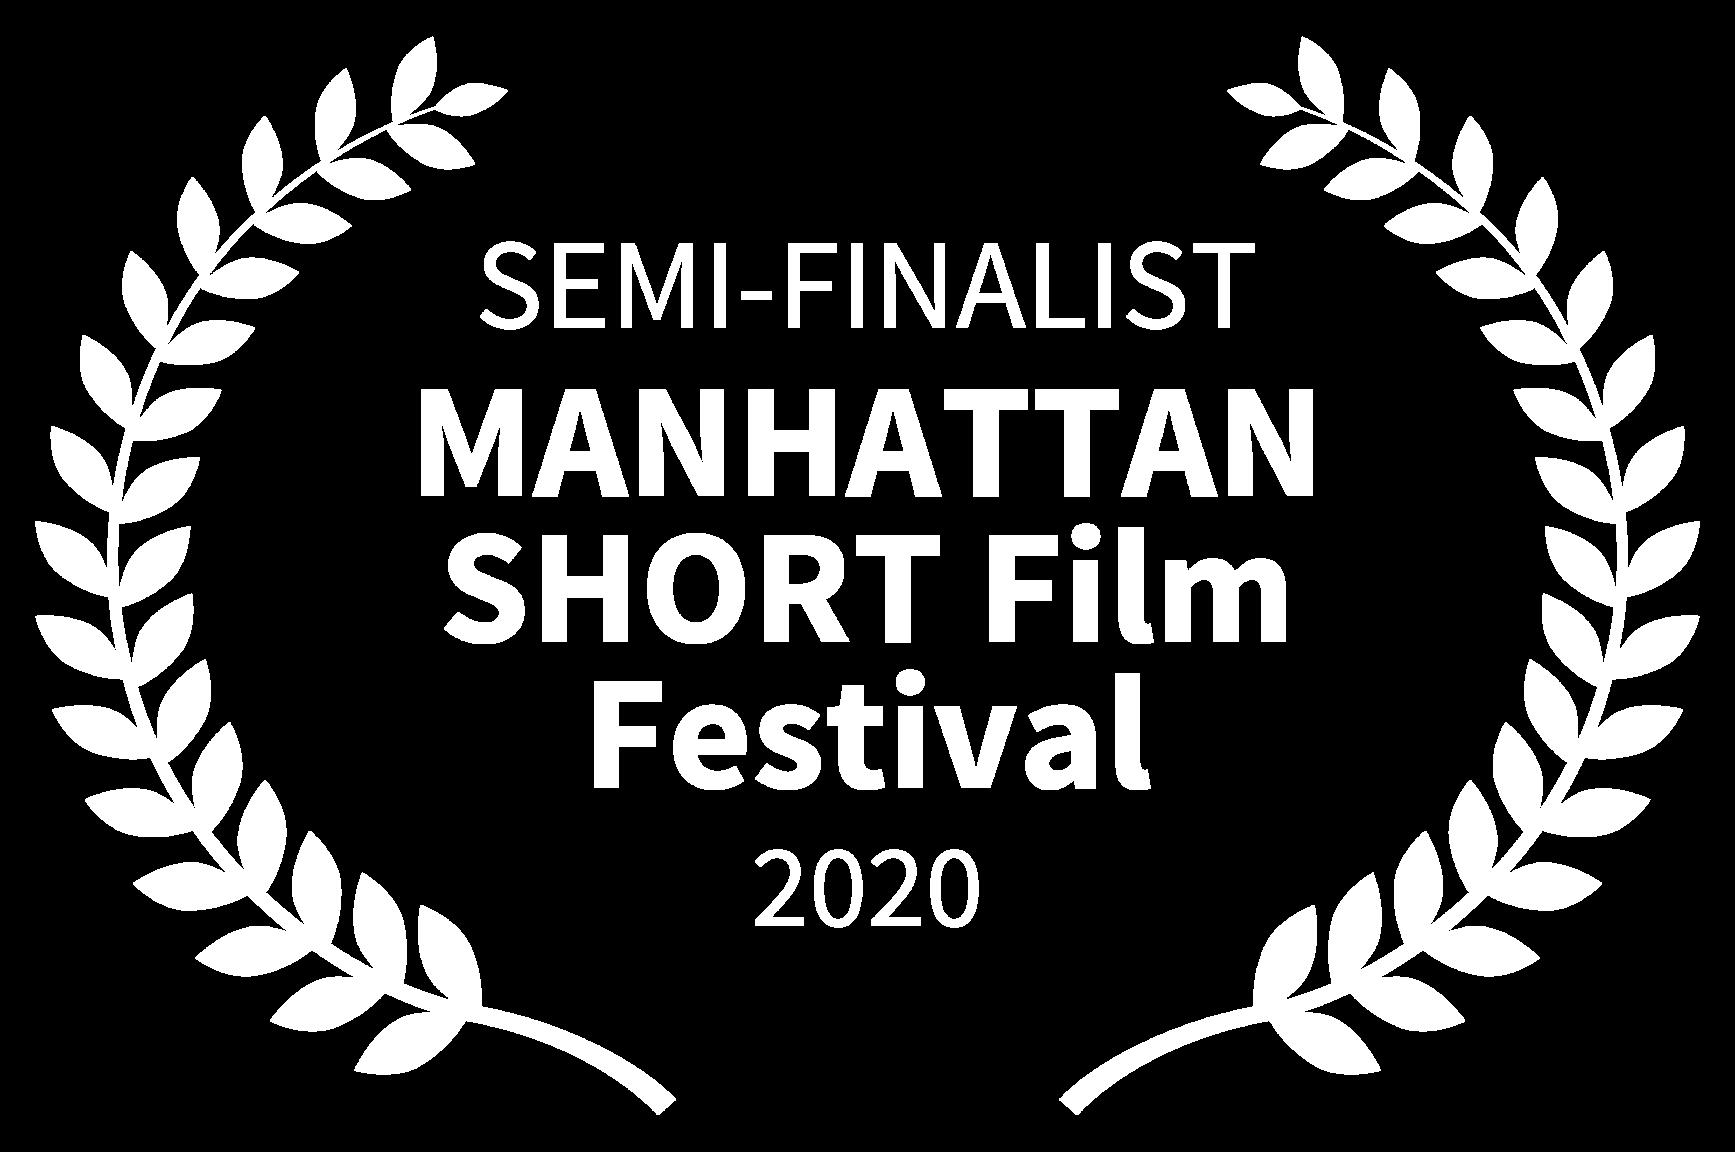 SEMI-FINALIST - MANHATTAN SHORT Film Festival - 2020